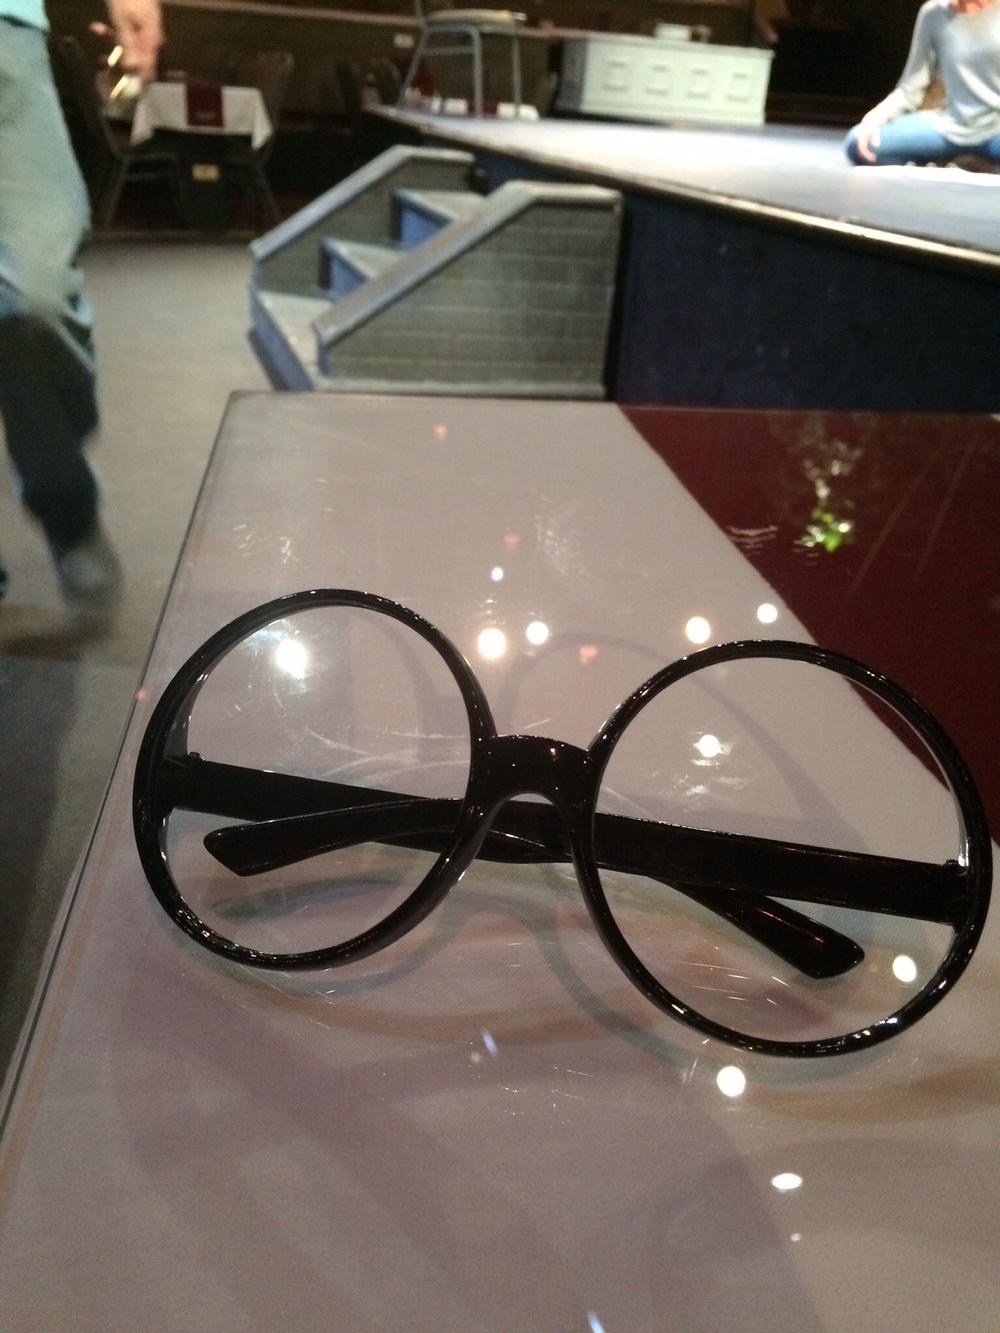 My professor glasses!